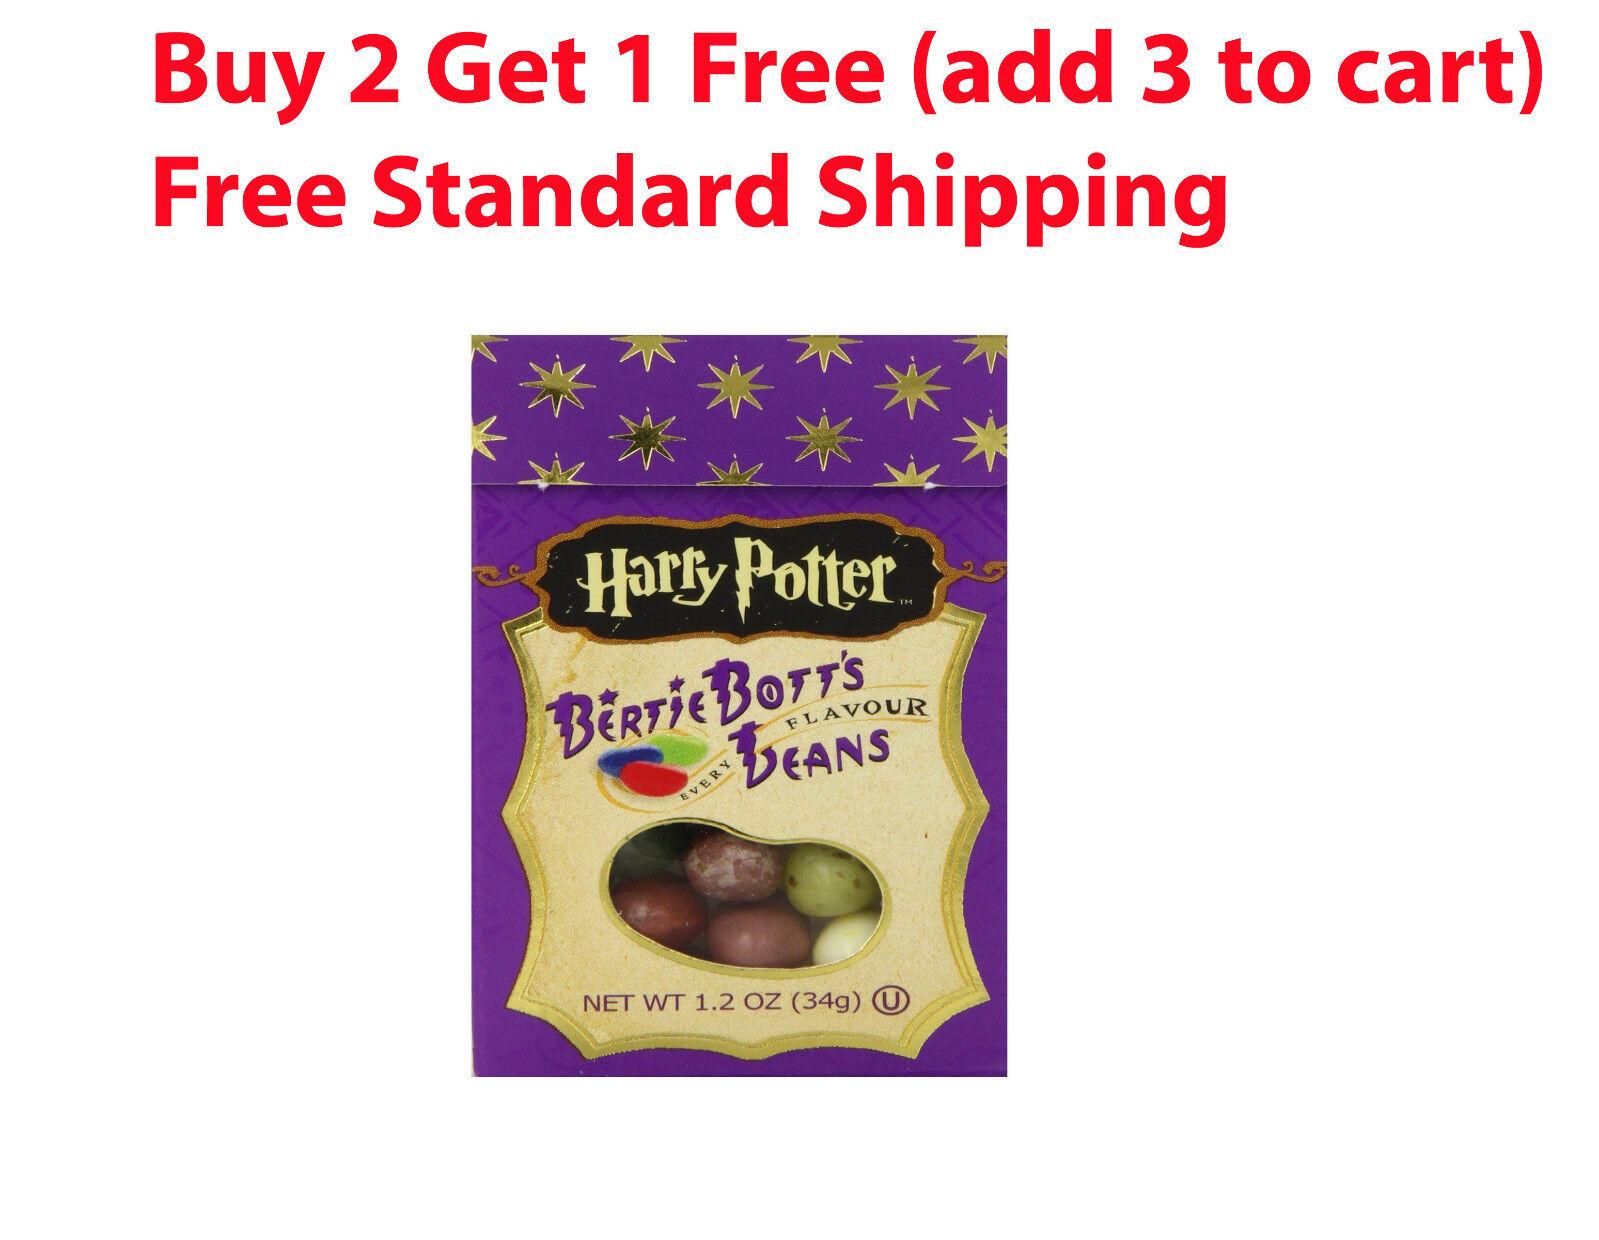 Harry Potter jelly Belly Beans BERTIE BOTTS 1.2 oz Every Fla